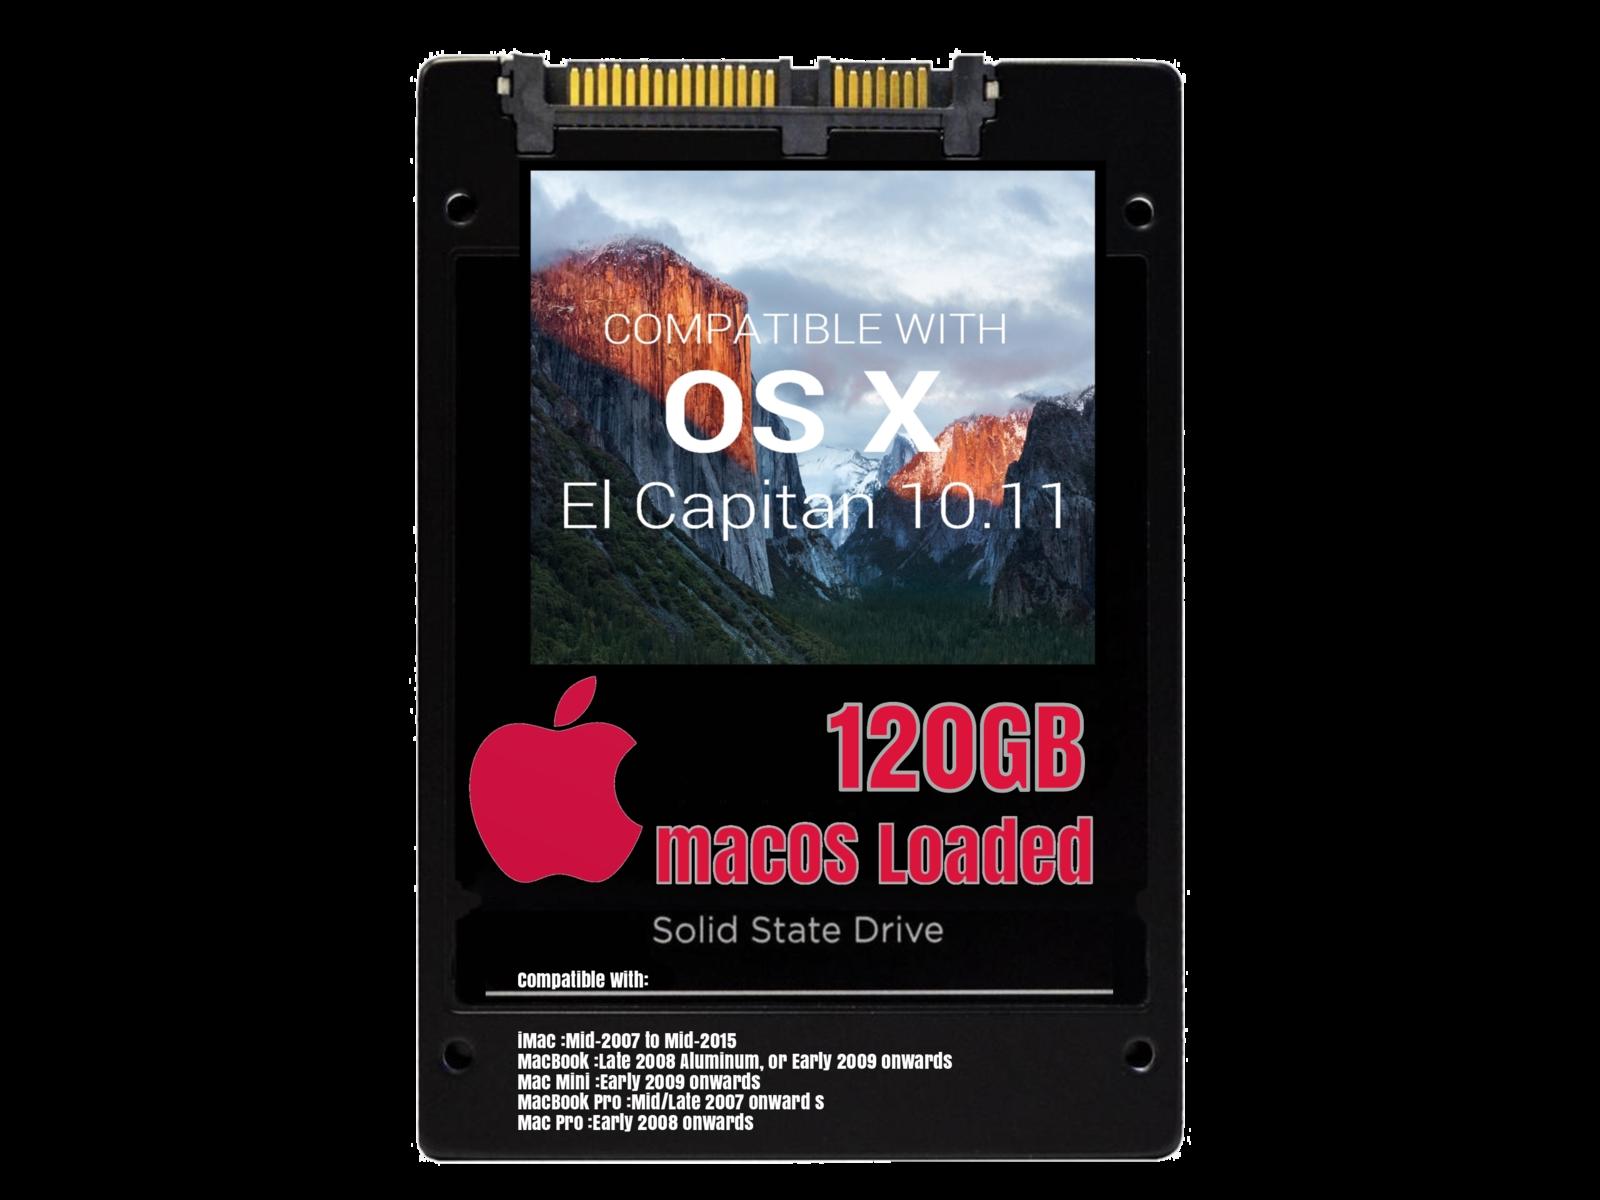 macOS Mac OS X 10.11 El Capitan Preloaded on 120GB Solid State Drive - $39.99